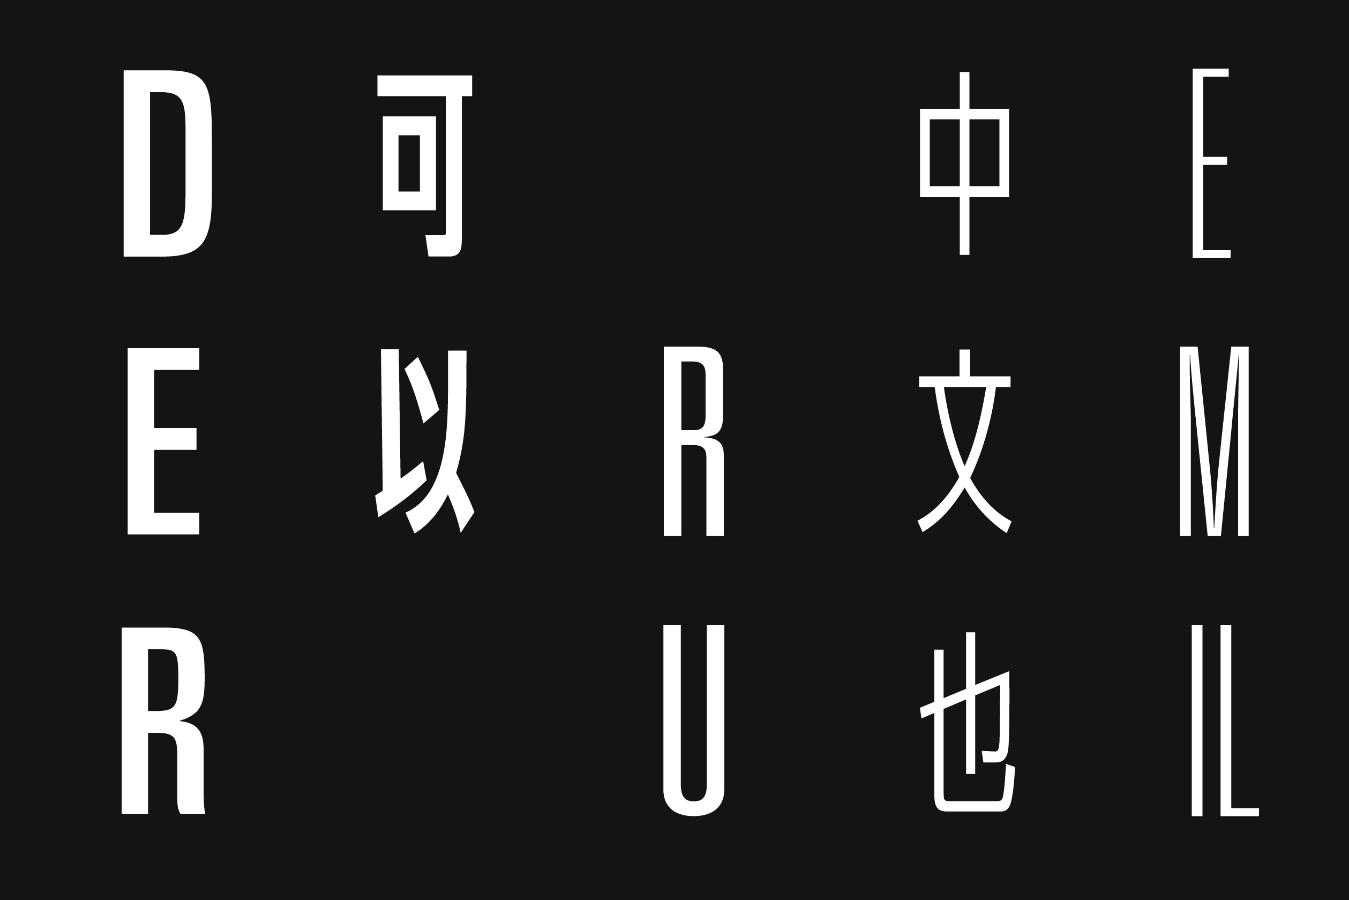 Emil Ruder中文也可以!解密國際主義大師之作 發掘編排設計更多可能